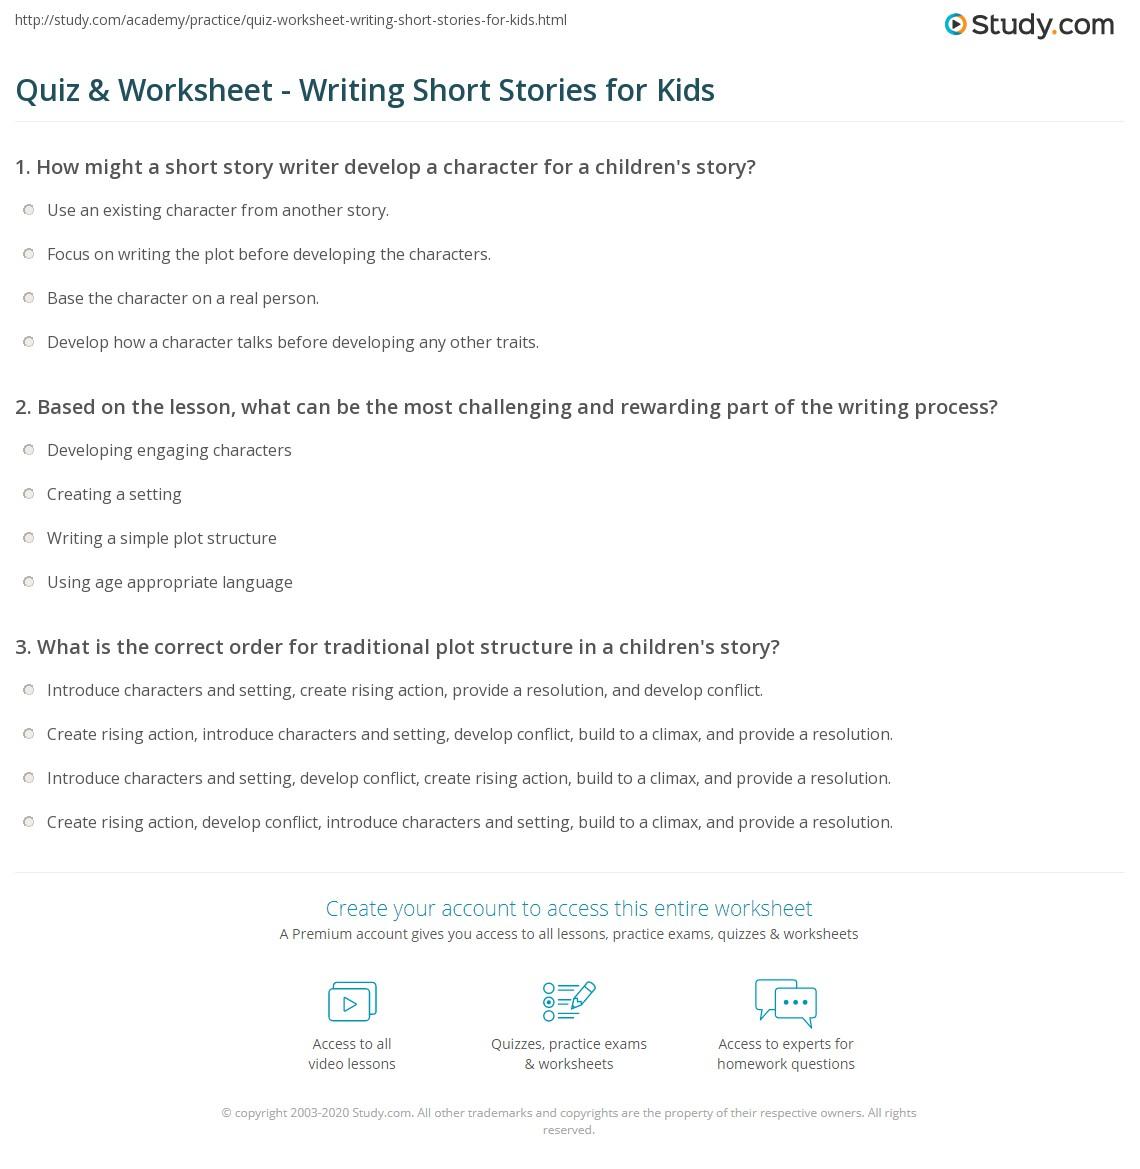 Quiz Worksheet Writing Short Stories for Kids – Creating a Character Worksheet